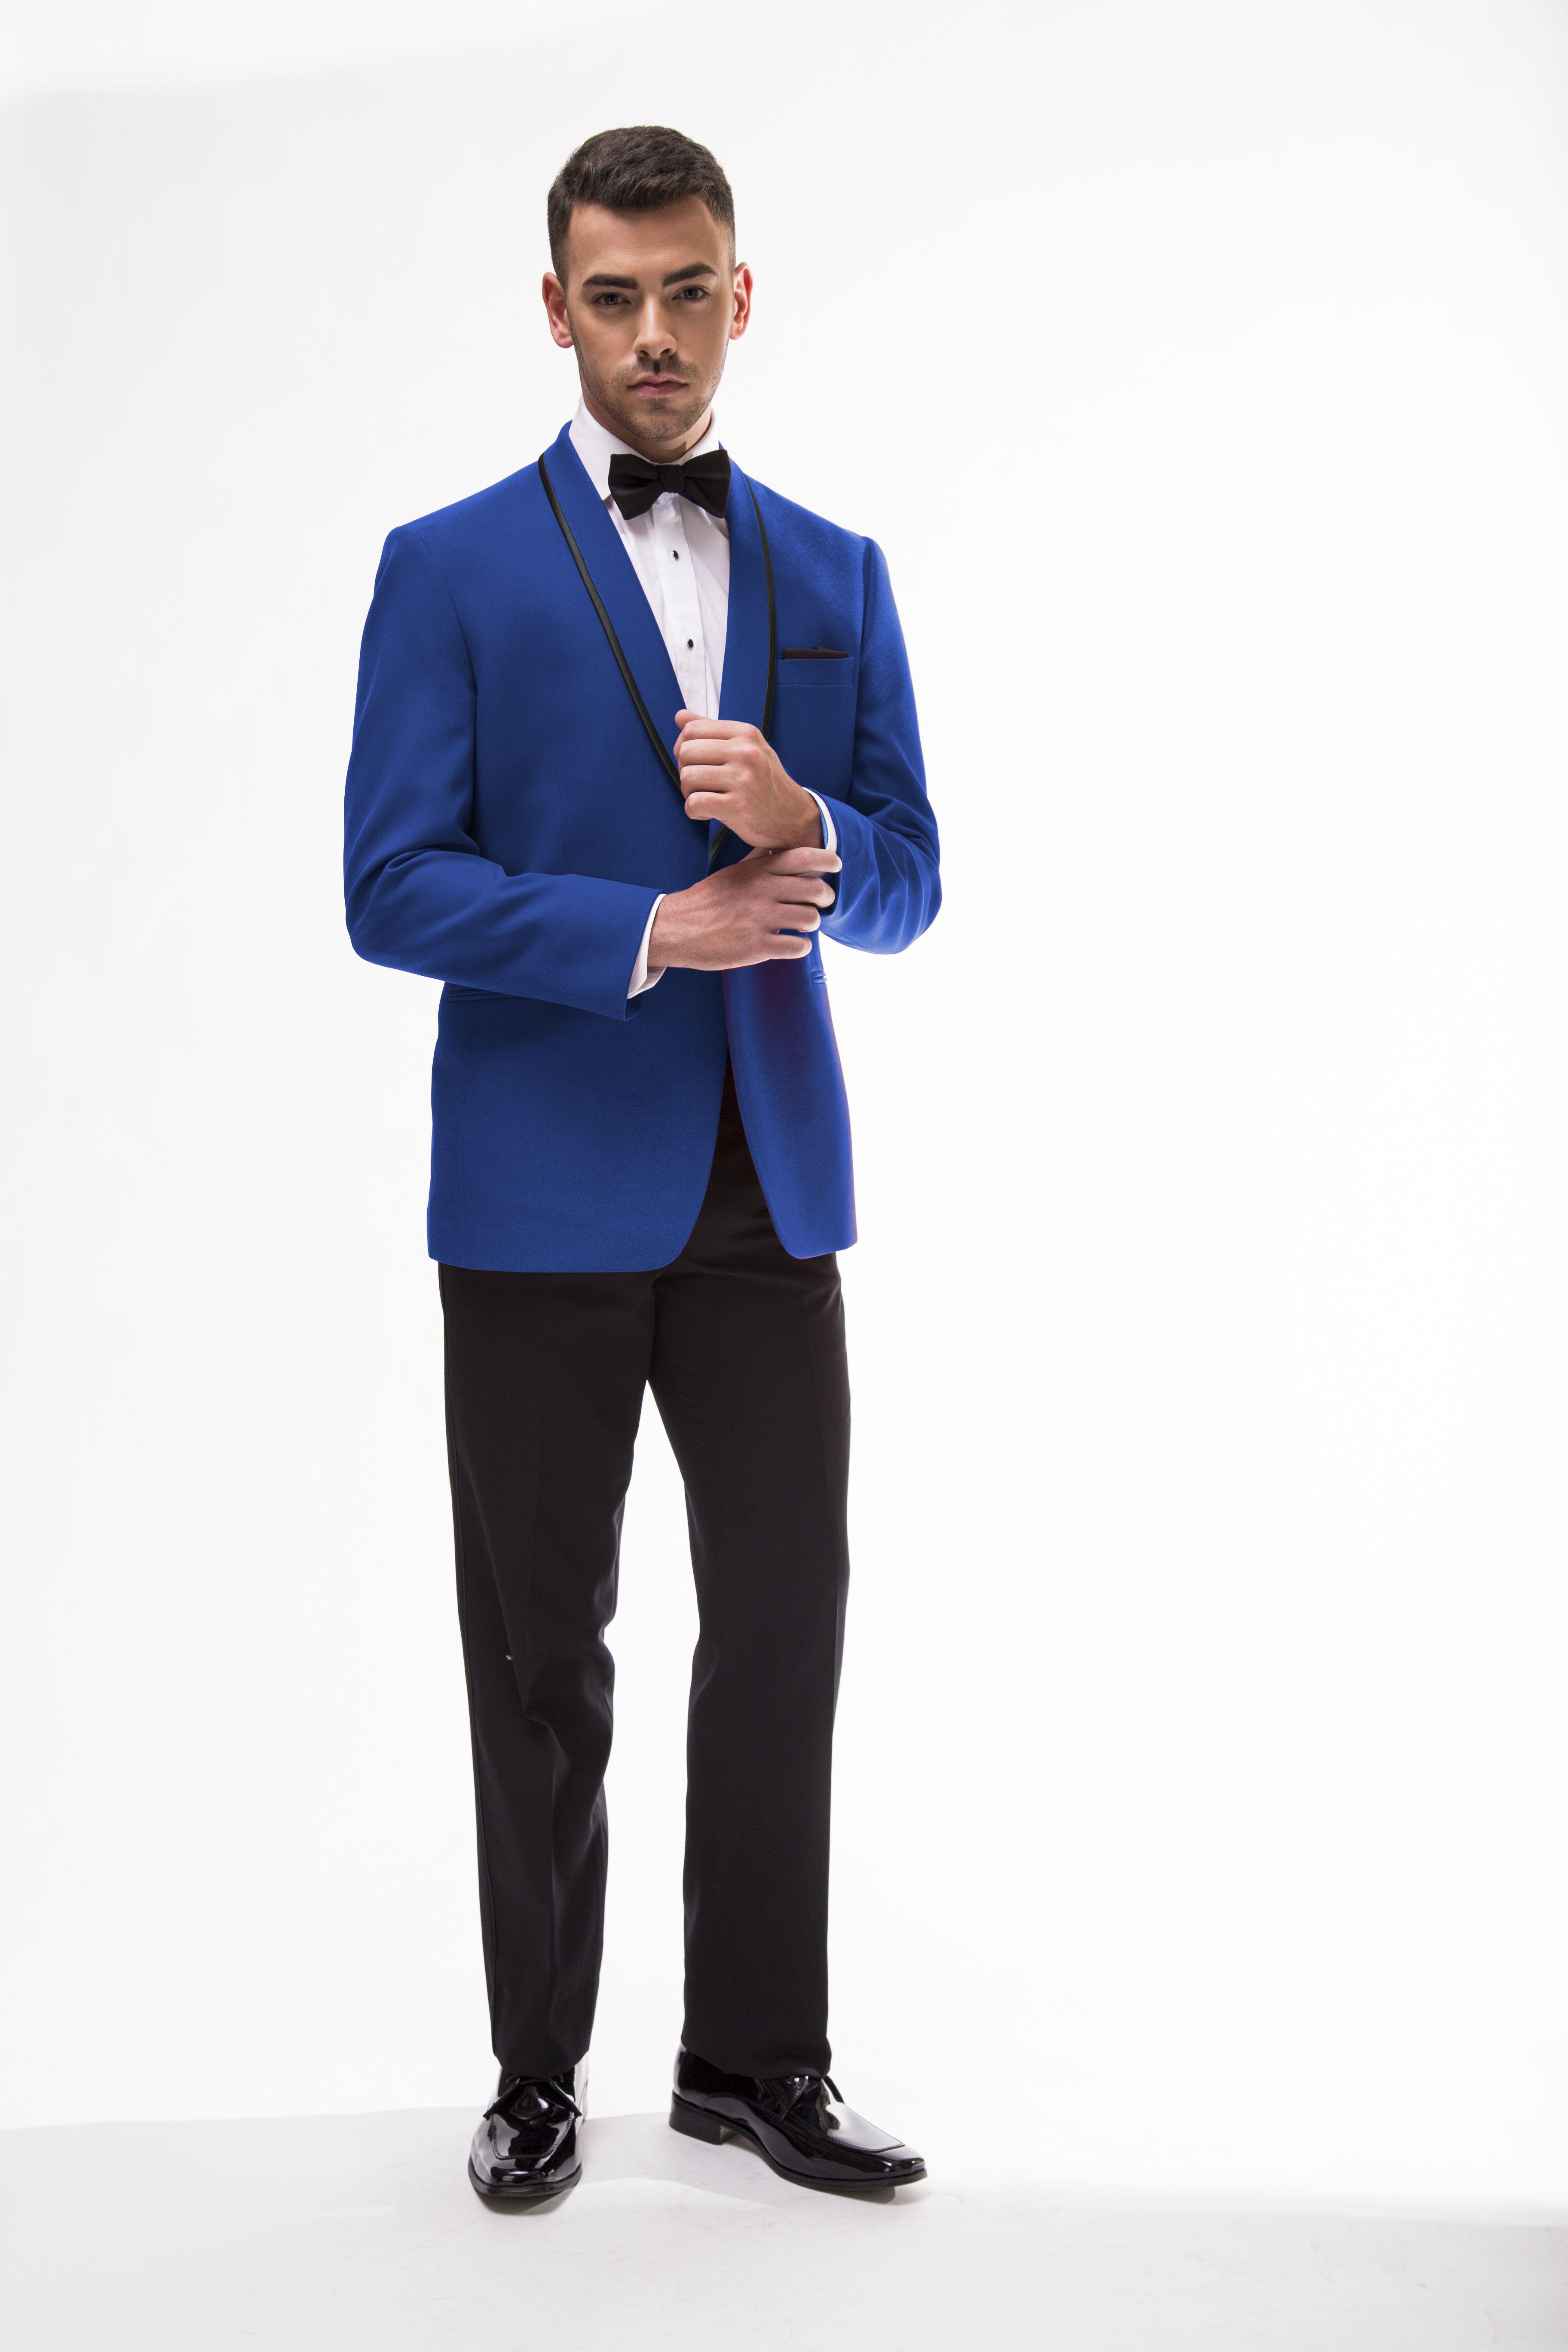 Royal Blue Connor Tuxedo | Tuxedos & Suits 2016 | Pinterest ...